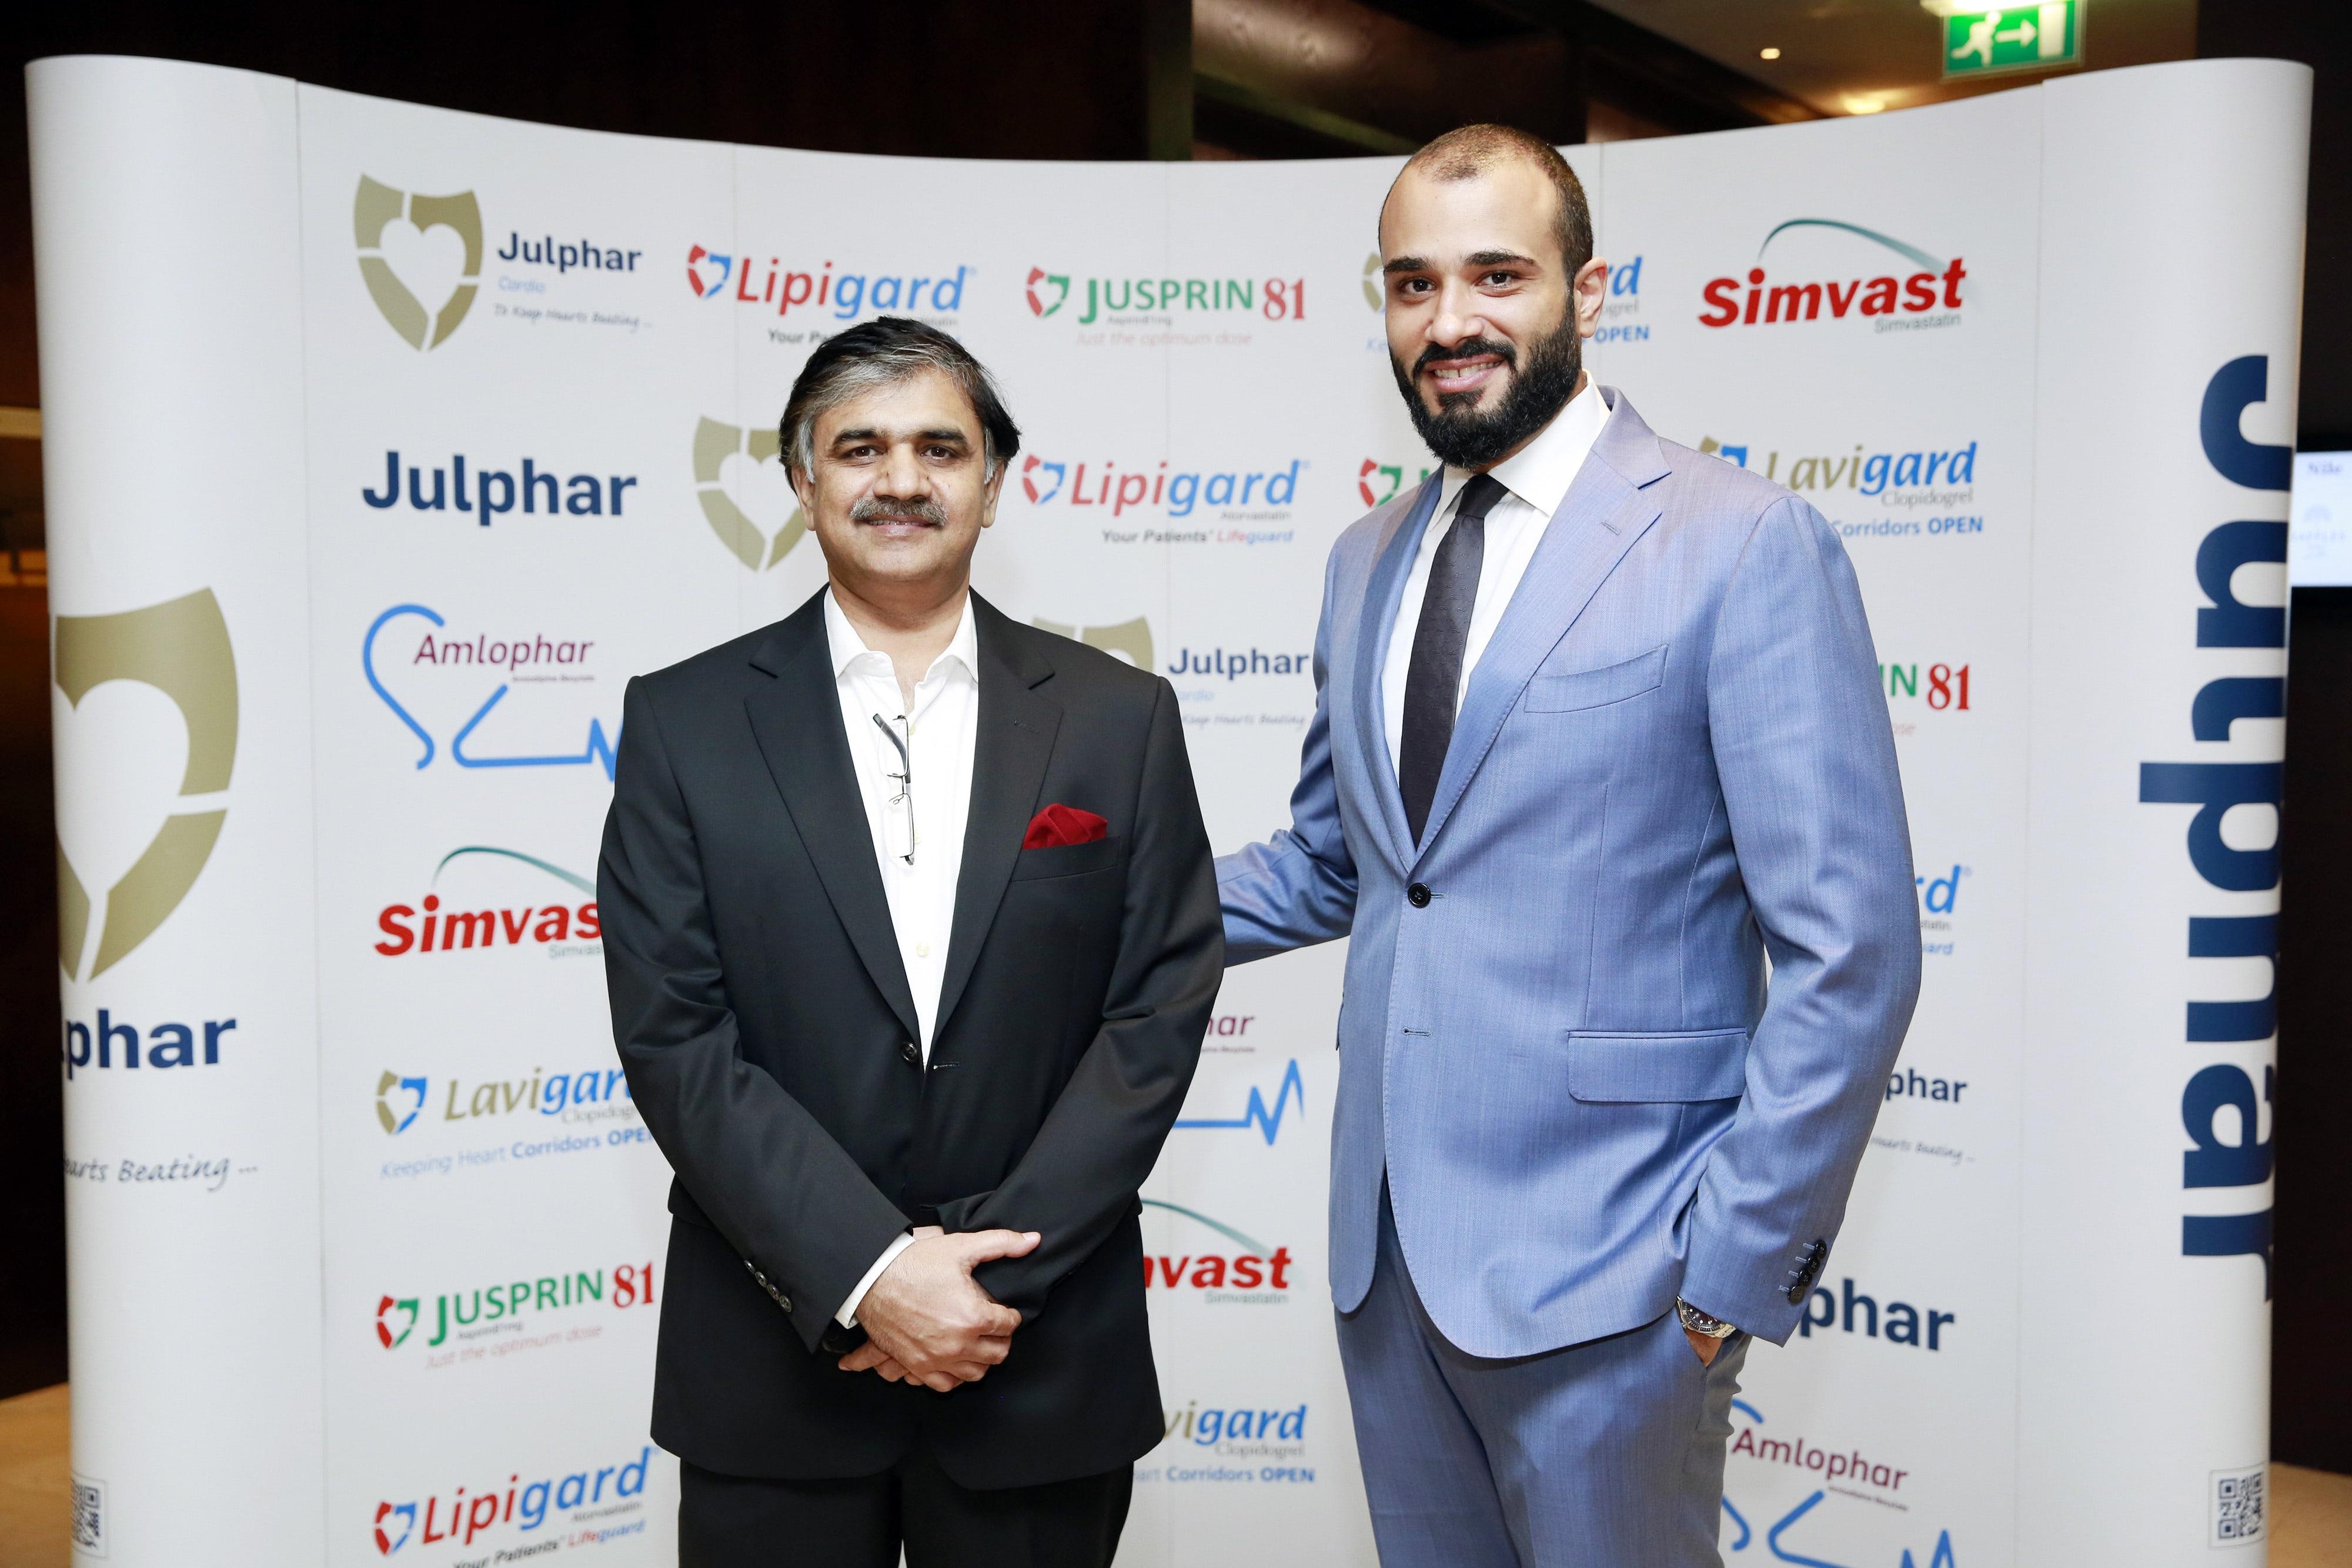 Julphar holds a Cardiovascular Boot Camp for physicians and pharmacists in Dubai